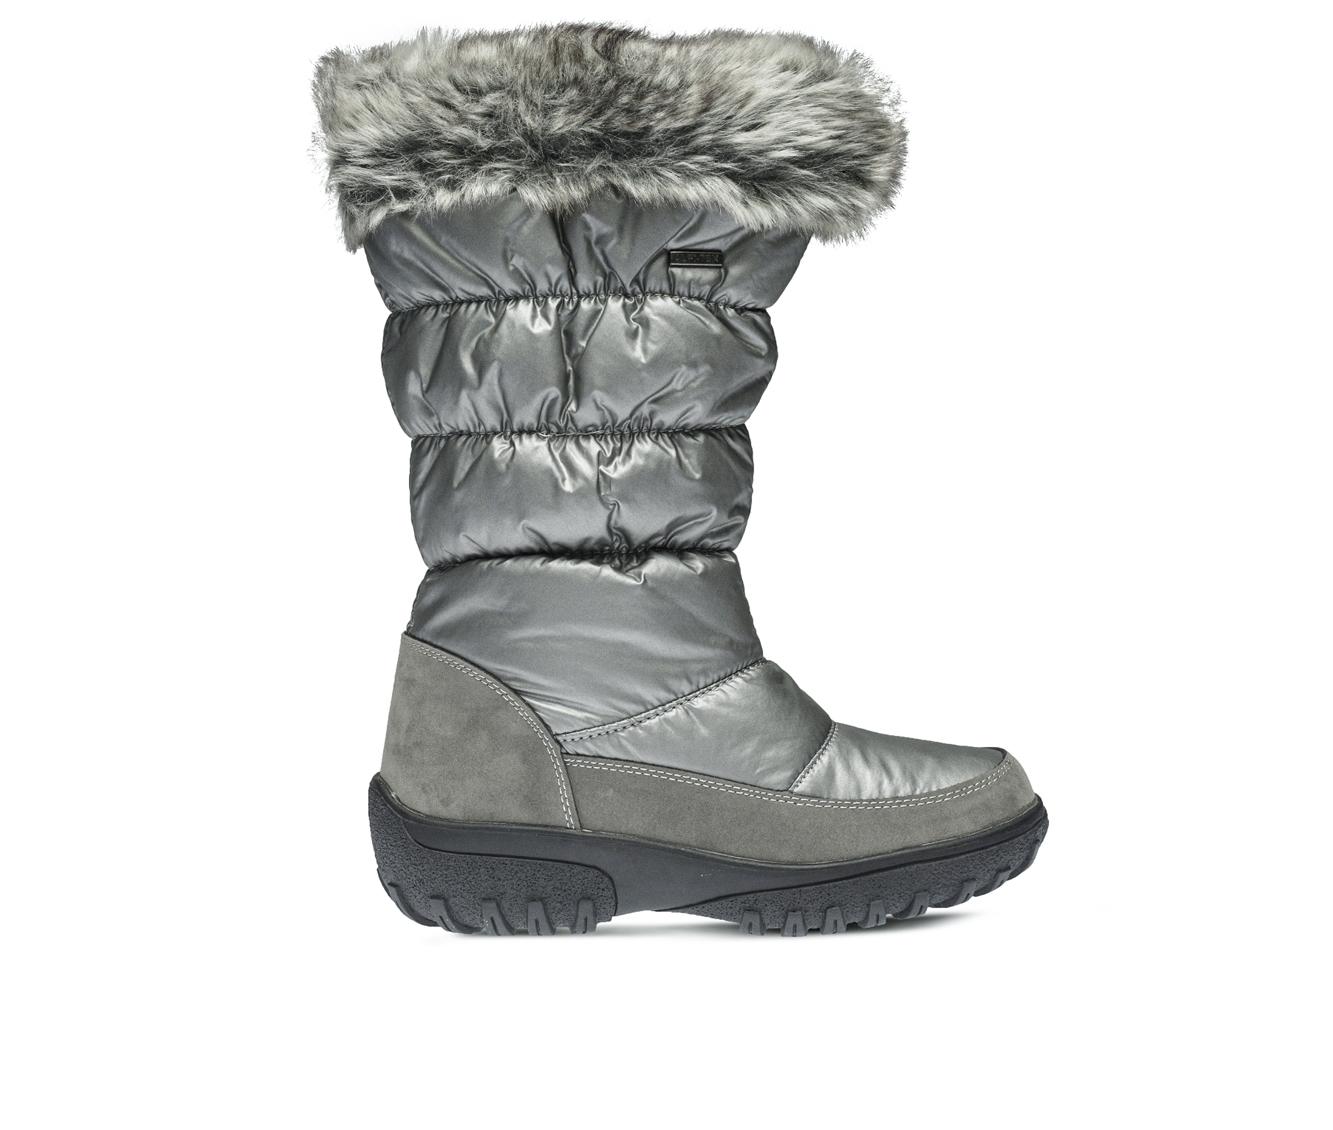 Flexus Vanish Women's Boots (Silver Canvas)